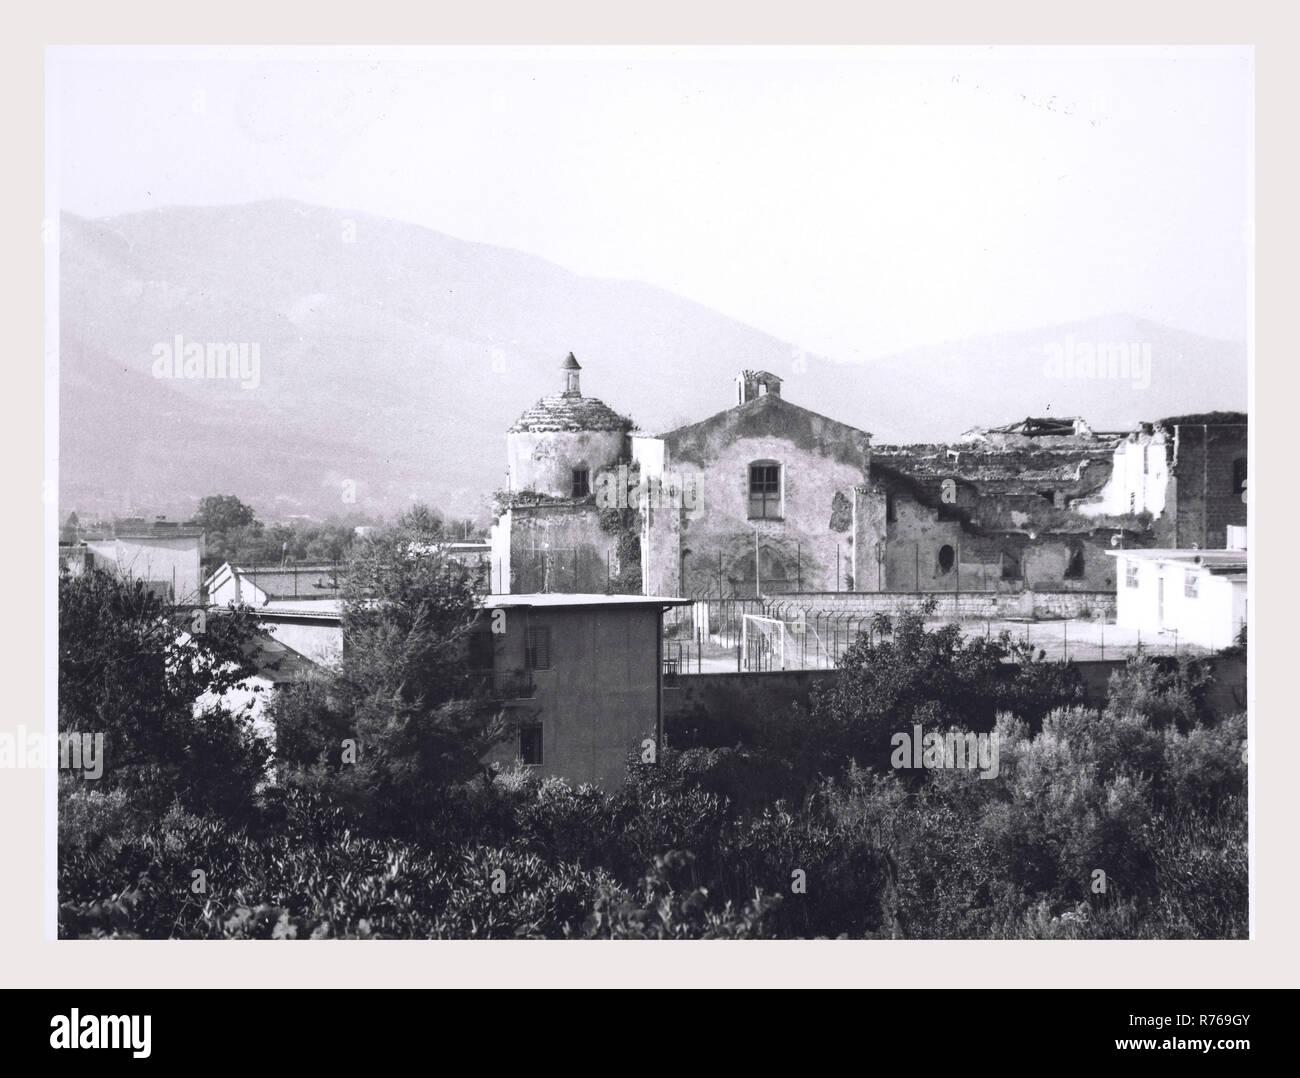 Campania Caserta Sessa Aurunca unidentified church, this is my Italy, the italian country of visual history, Exterior views Stock Photo